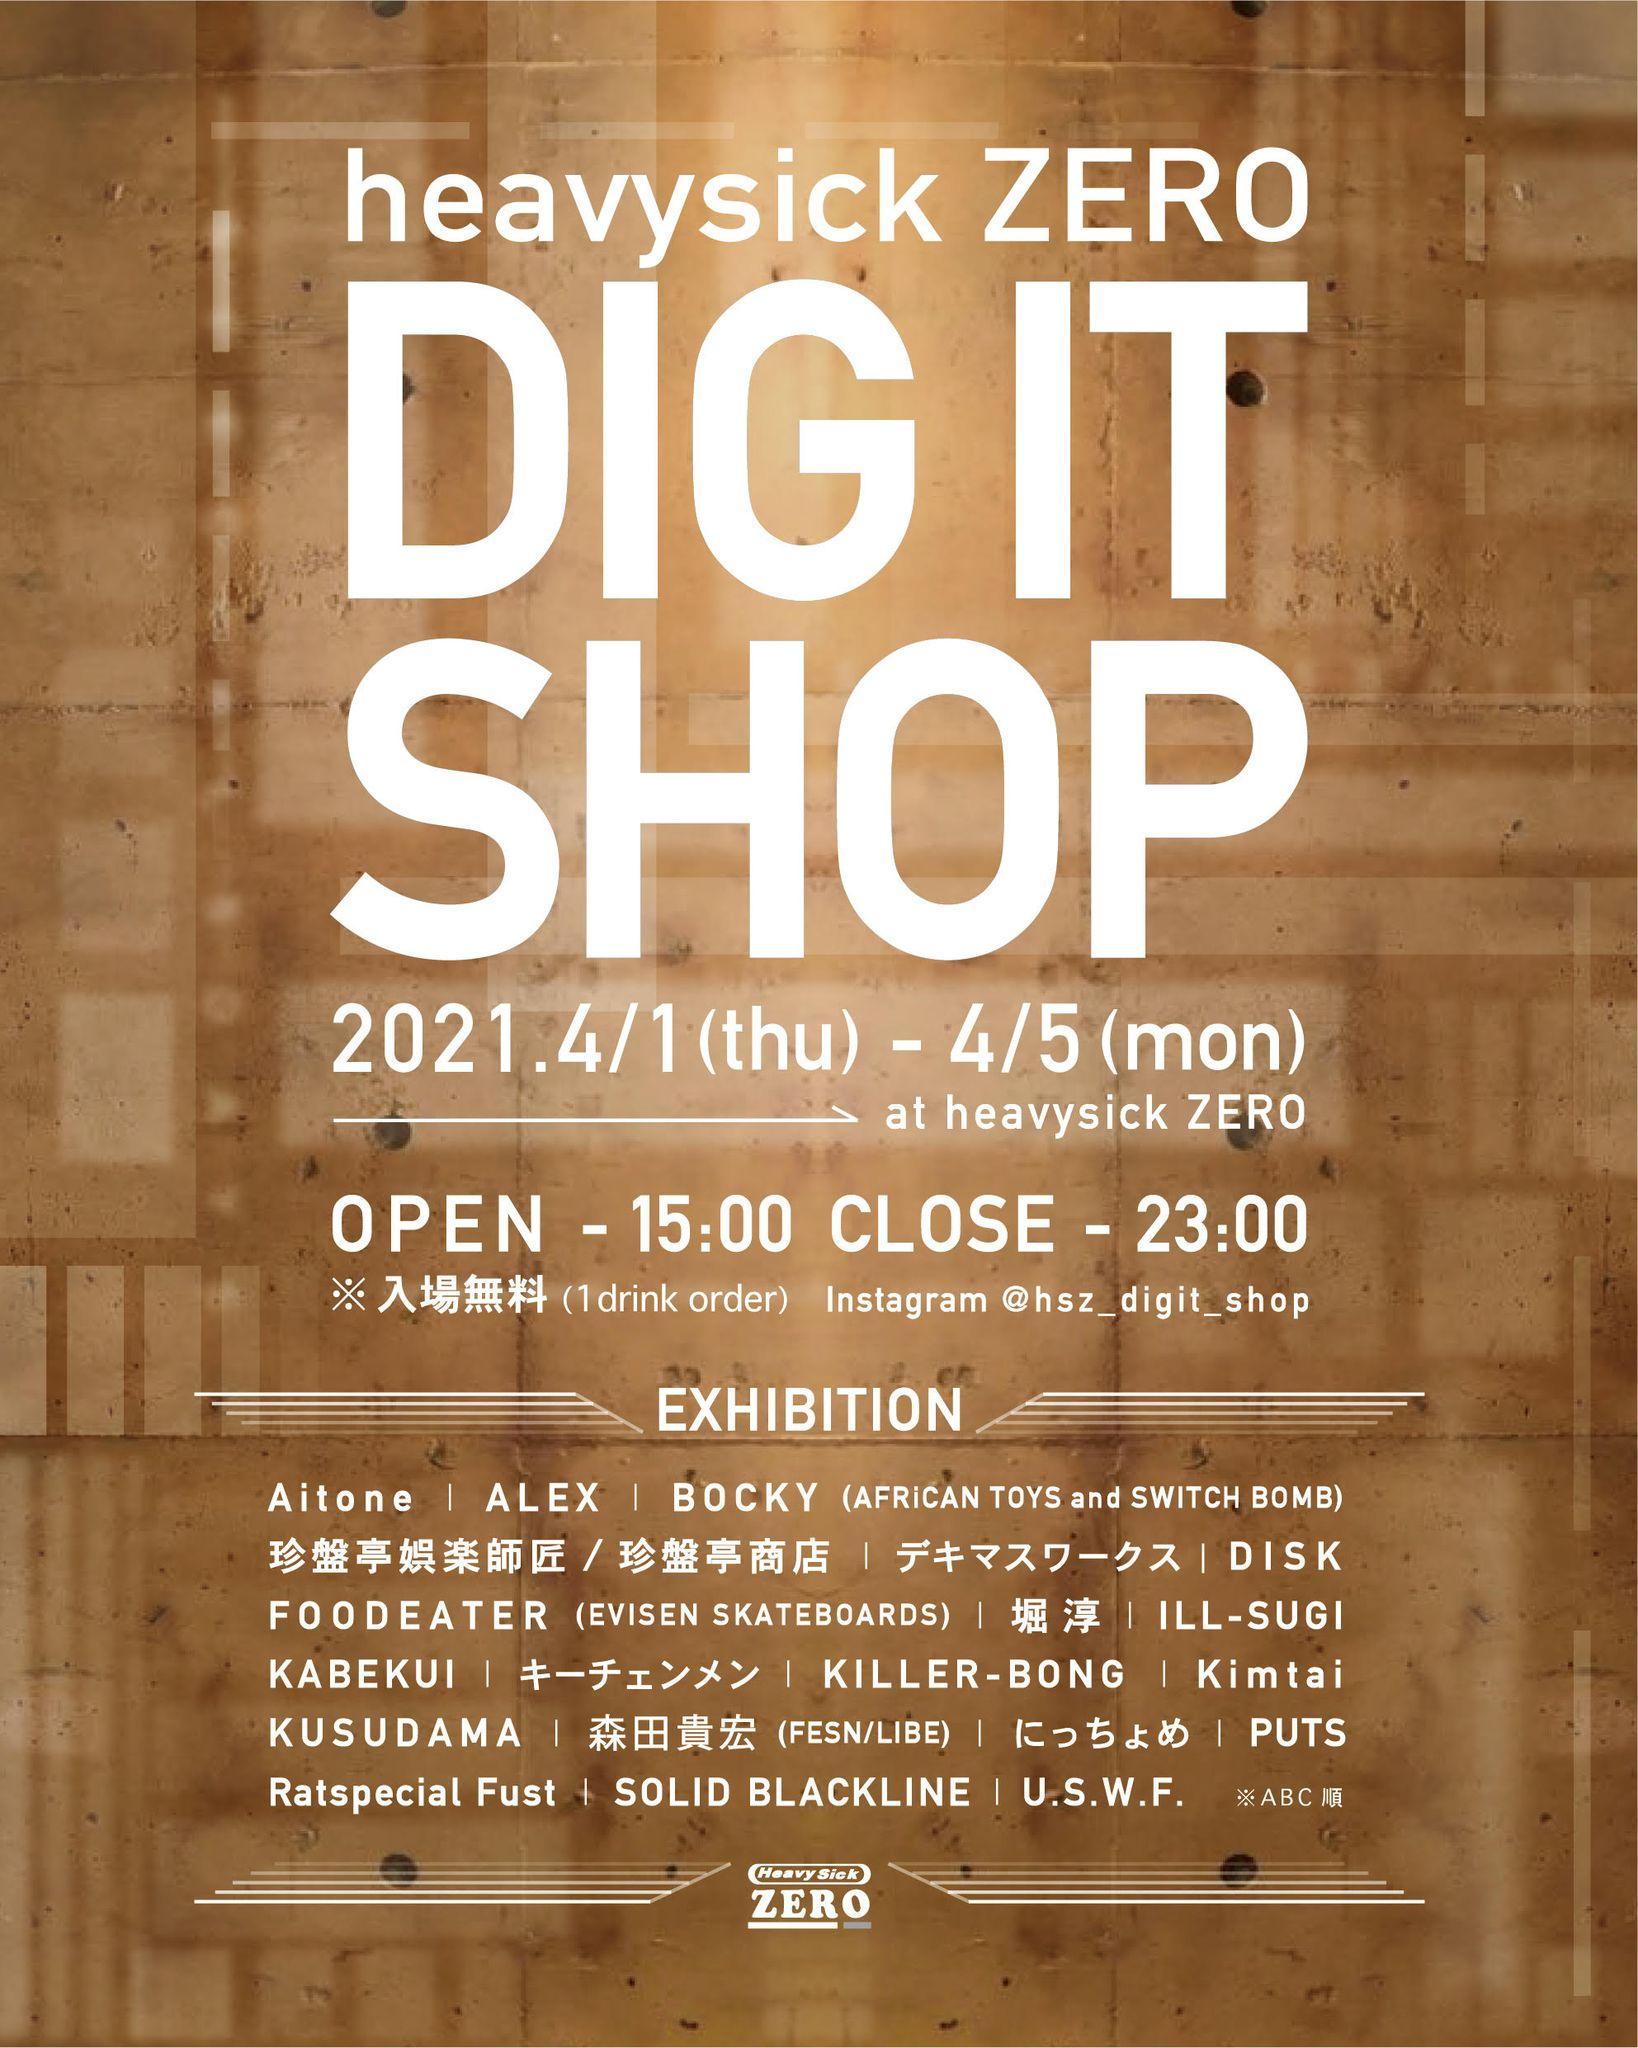 heavysick ZERO DIG IT SHOP【5日間限定】 2021.4/1(thu) – 4/5(mon)